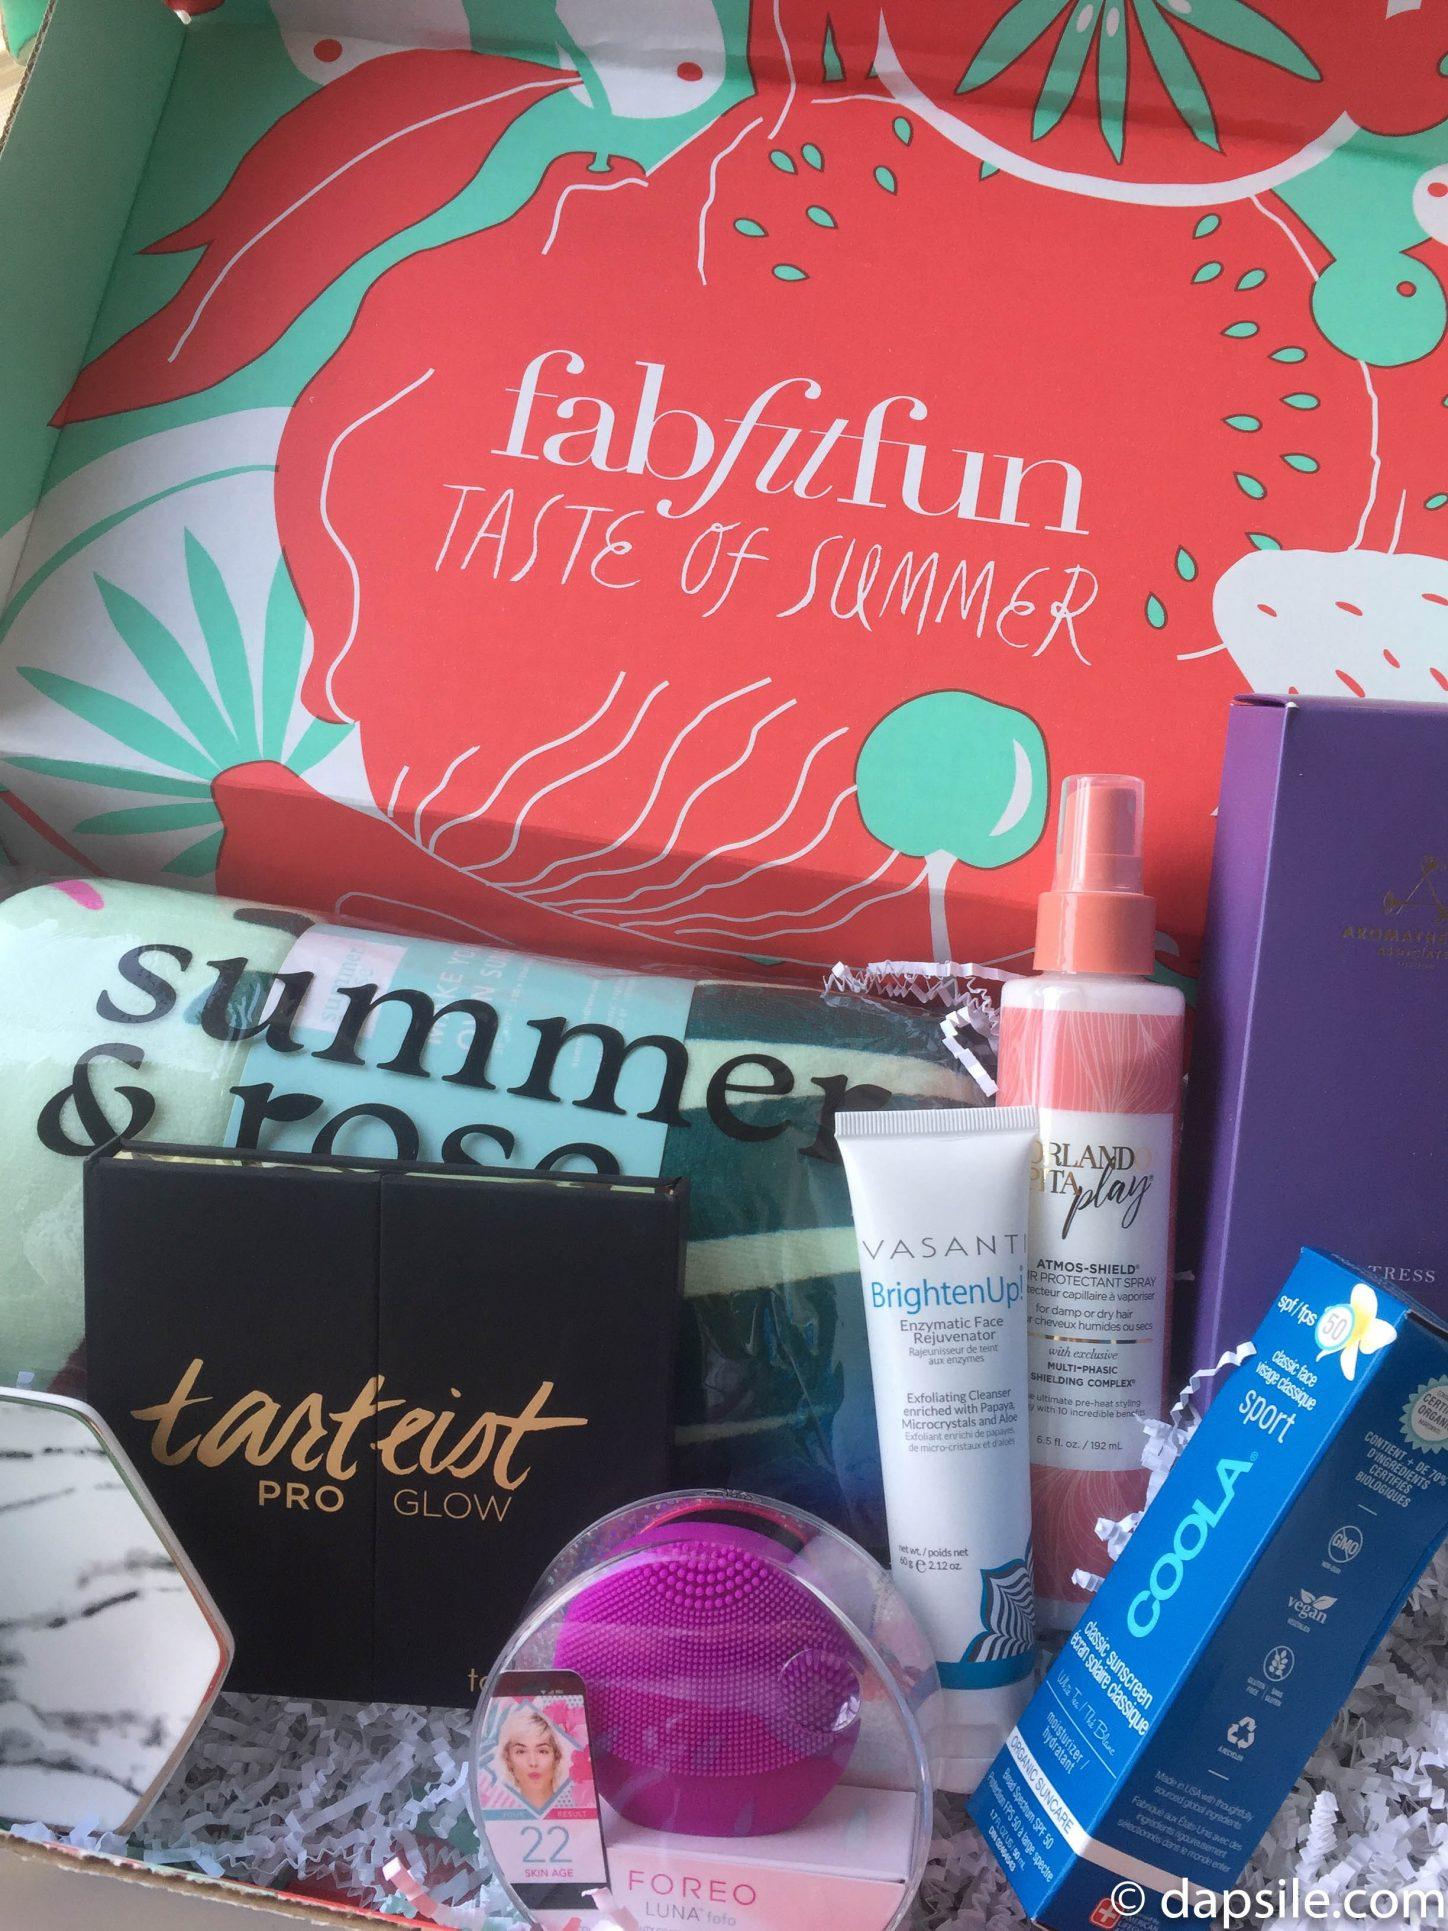 FabFitFun Summer 2018 Subscription Box opened